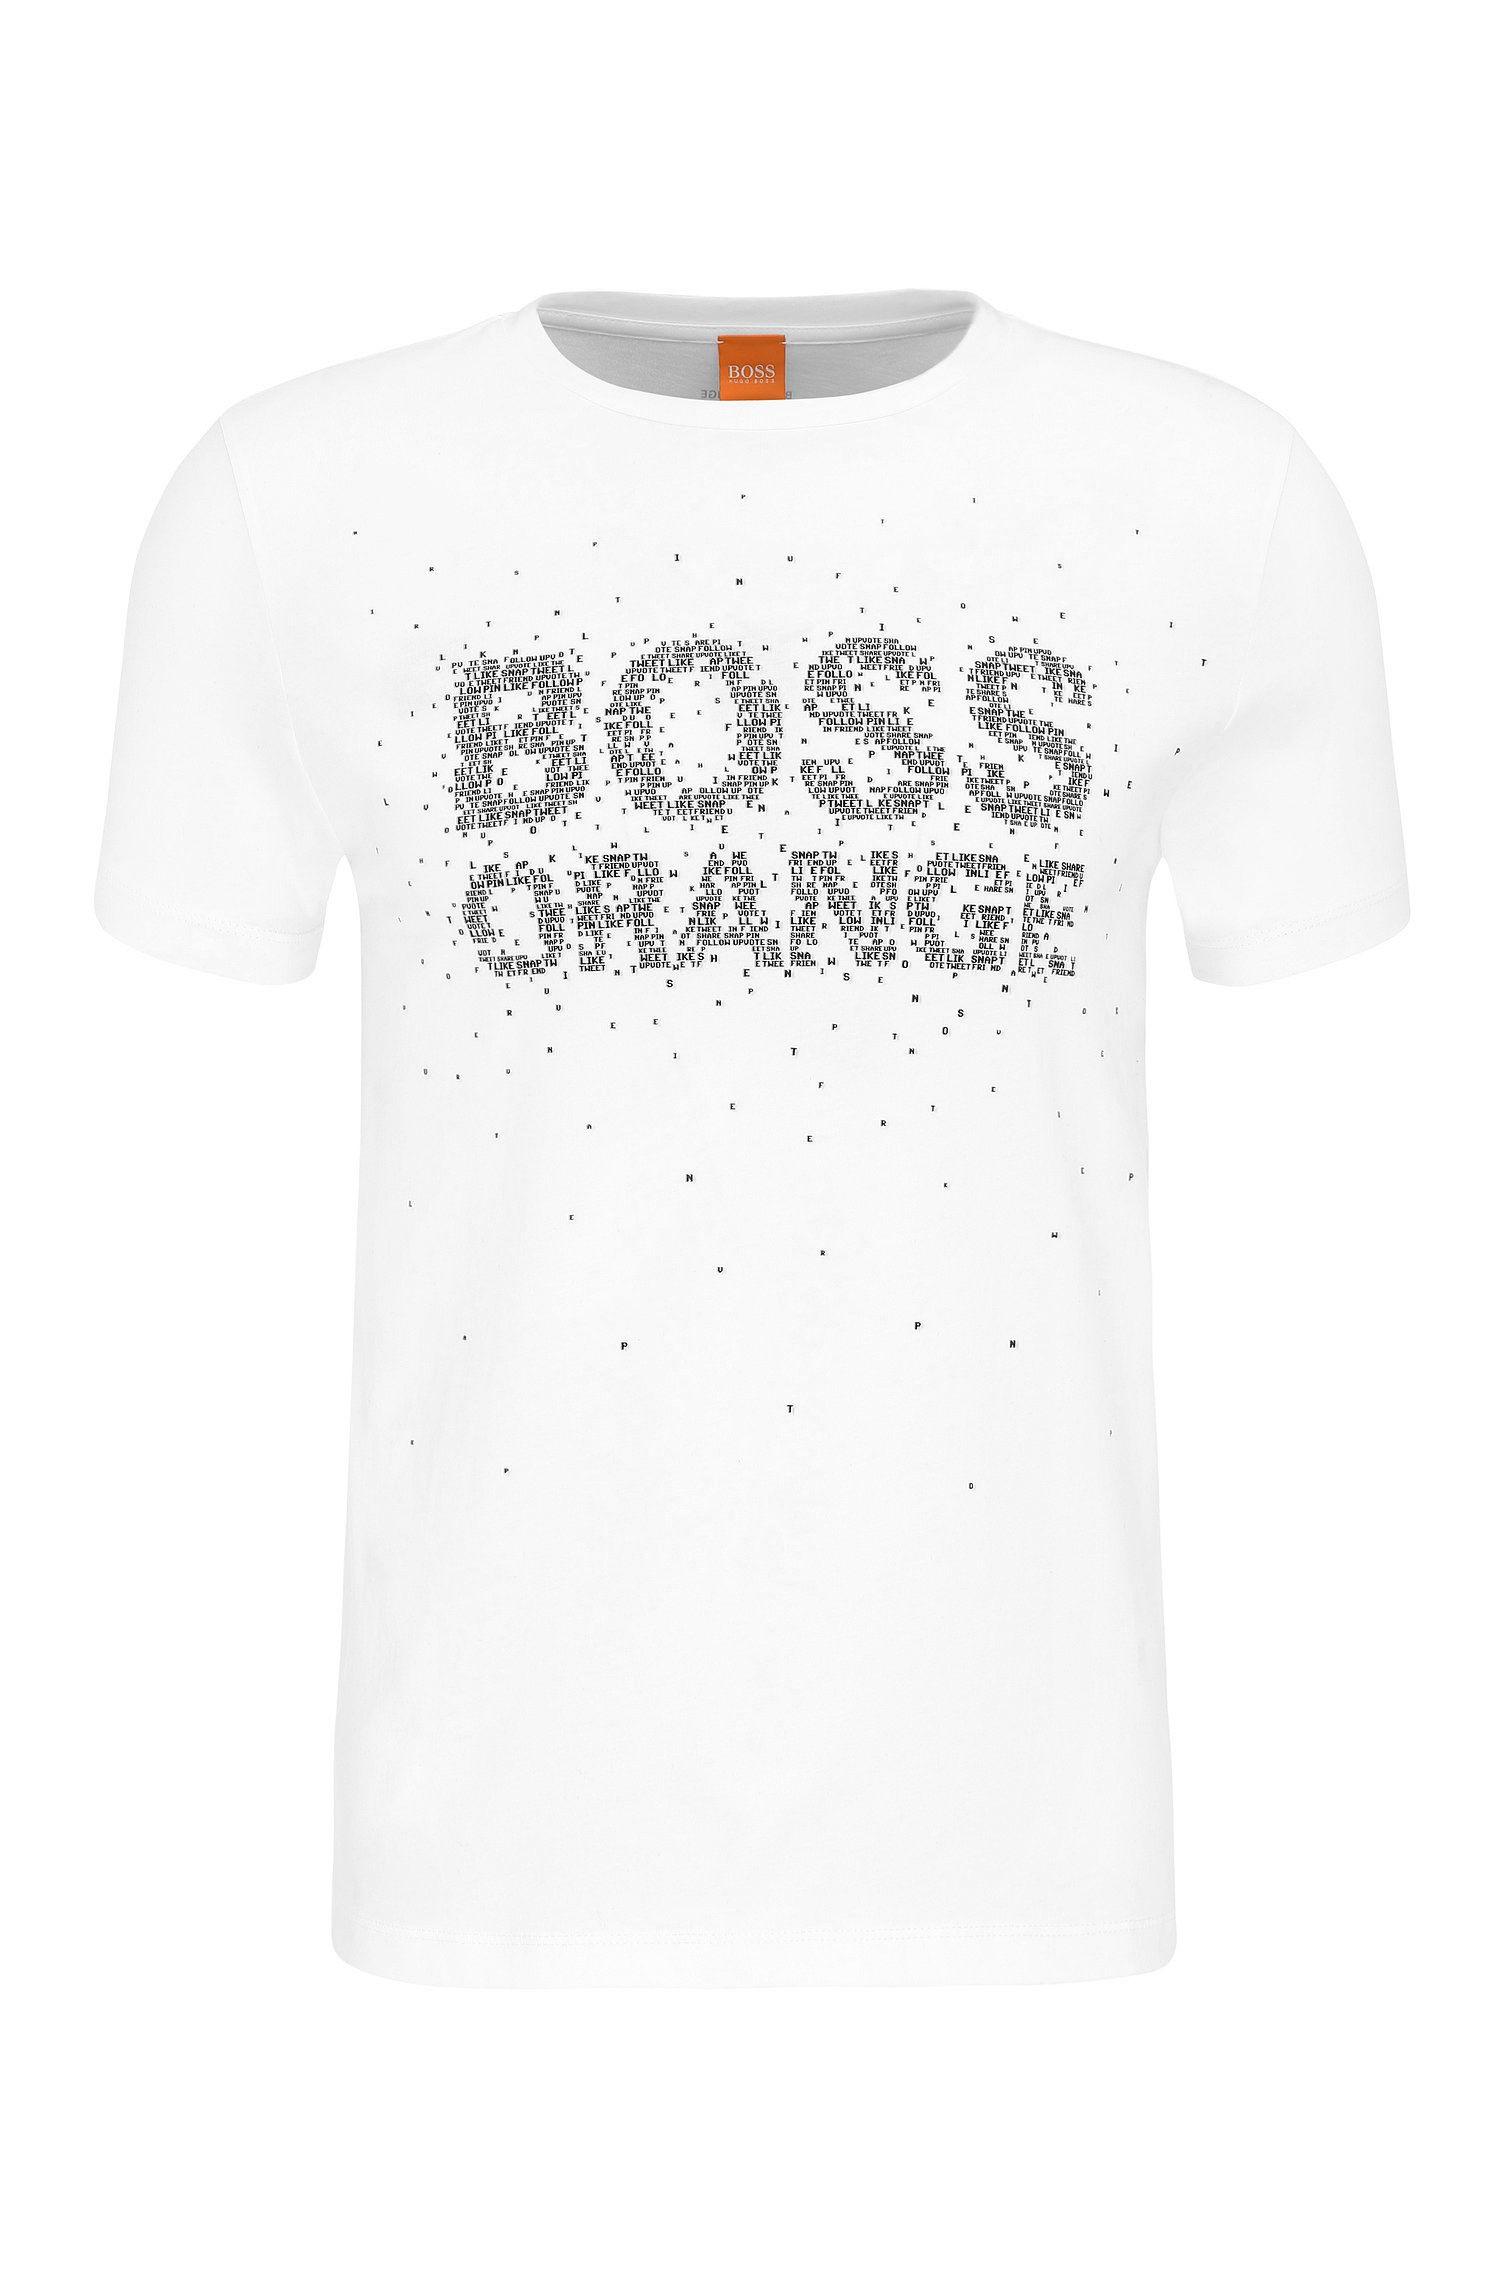 Cotton Graphic T-Shirt | Turbulence, White